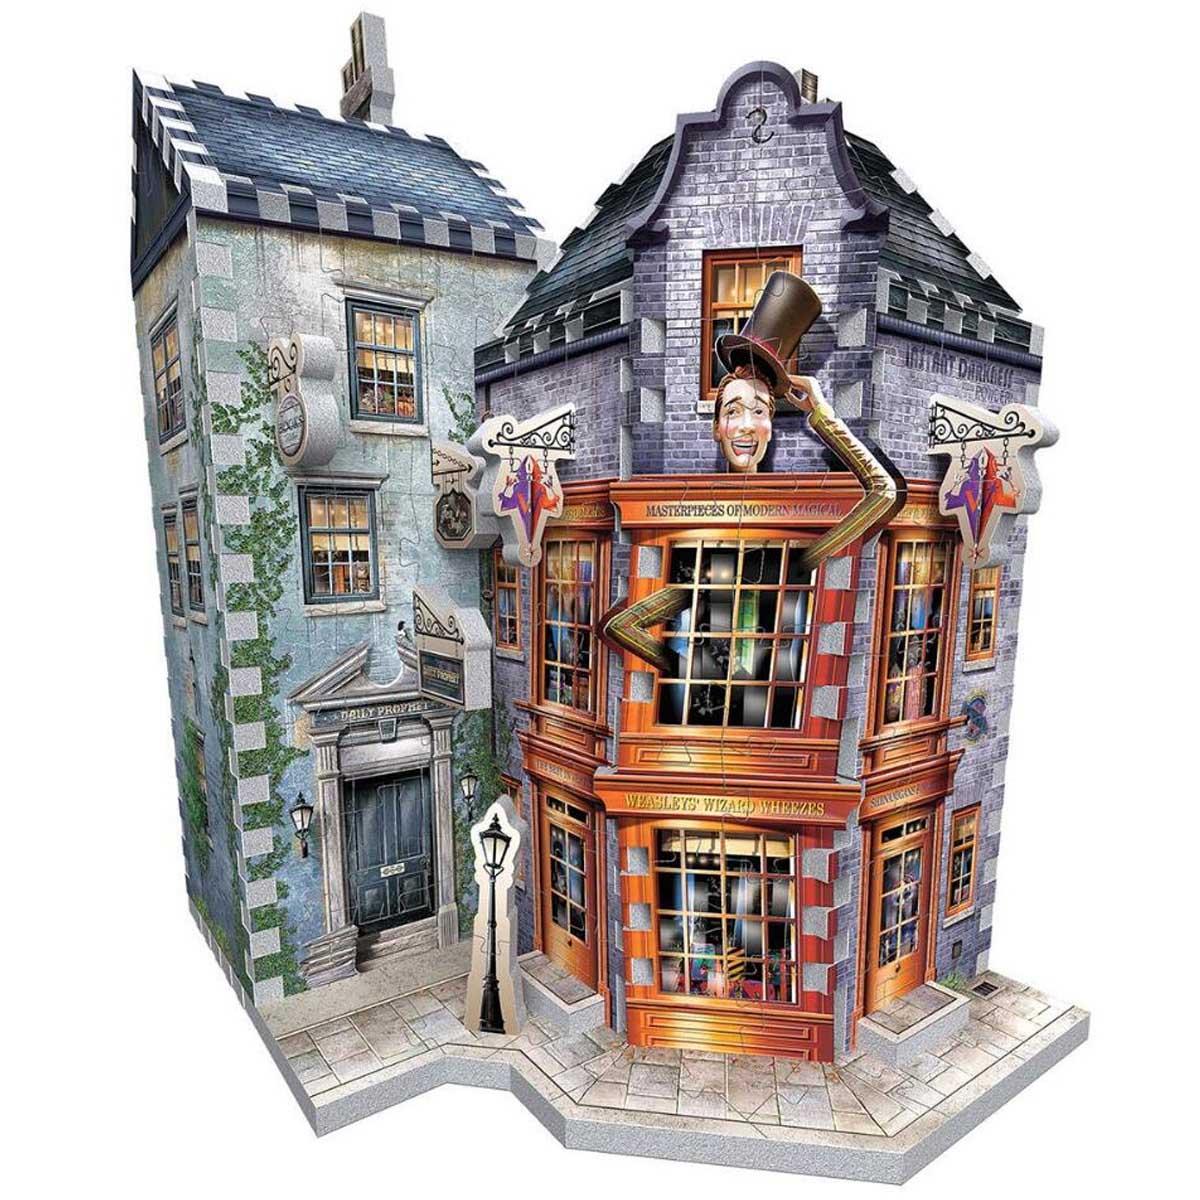 Weasleys' Wizard Wheezes & Daily Prophet New Harry Potter 3D Puzzle